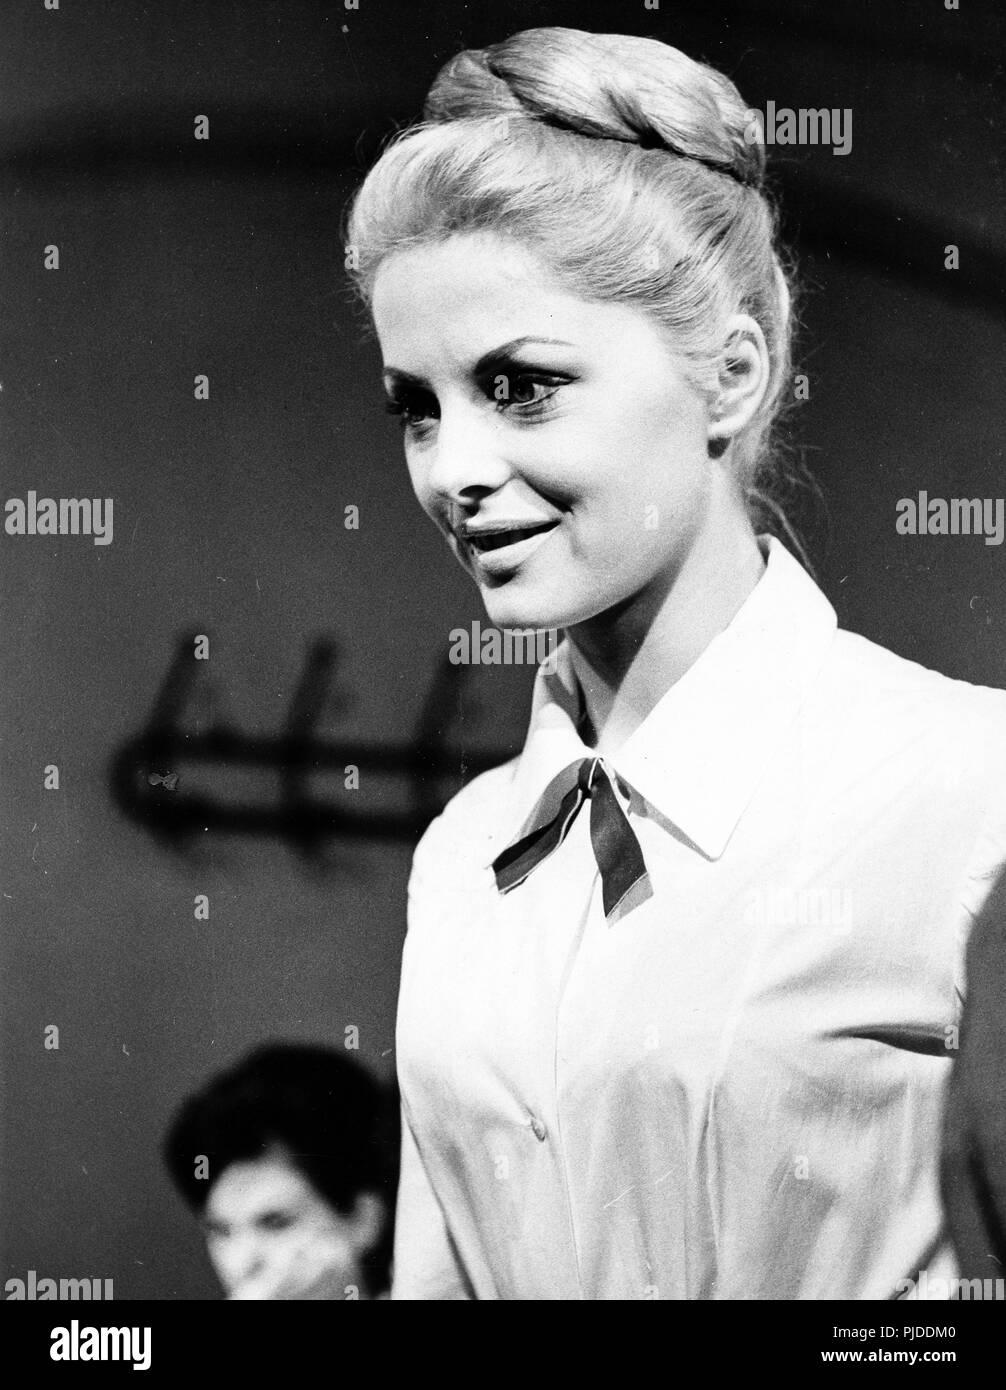 virna lisi, 5 marines per 100 ragazze, 1961 - Stock Image